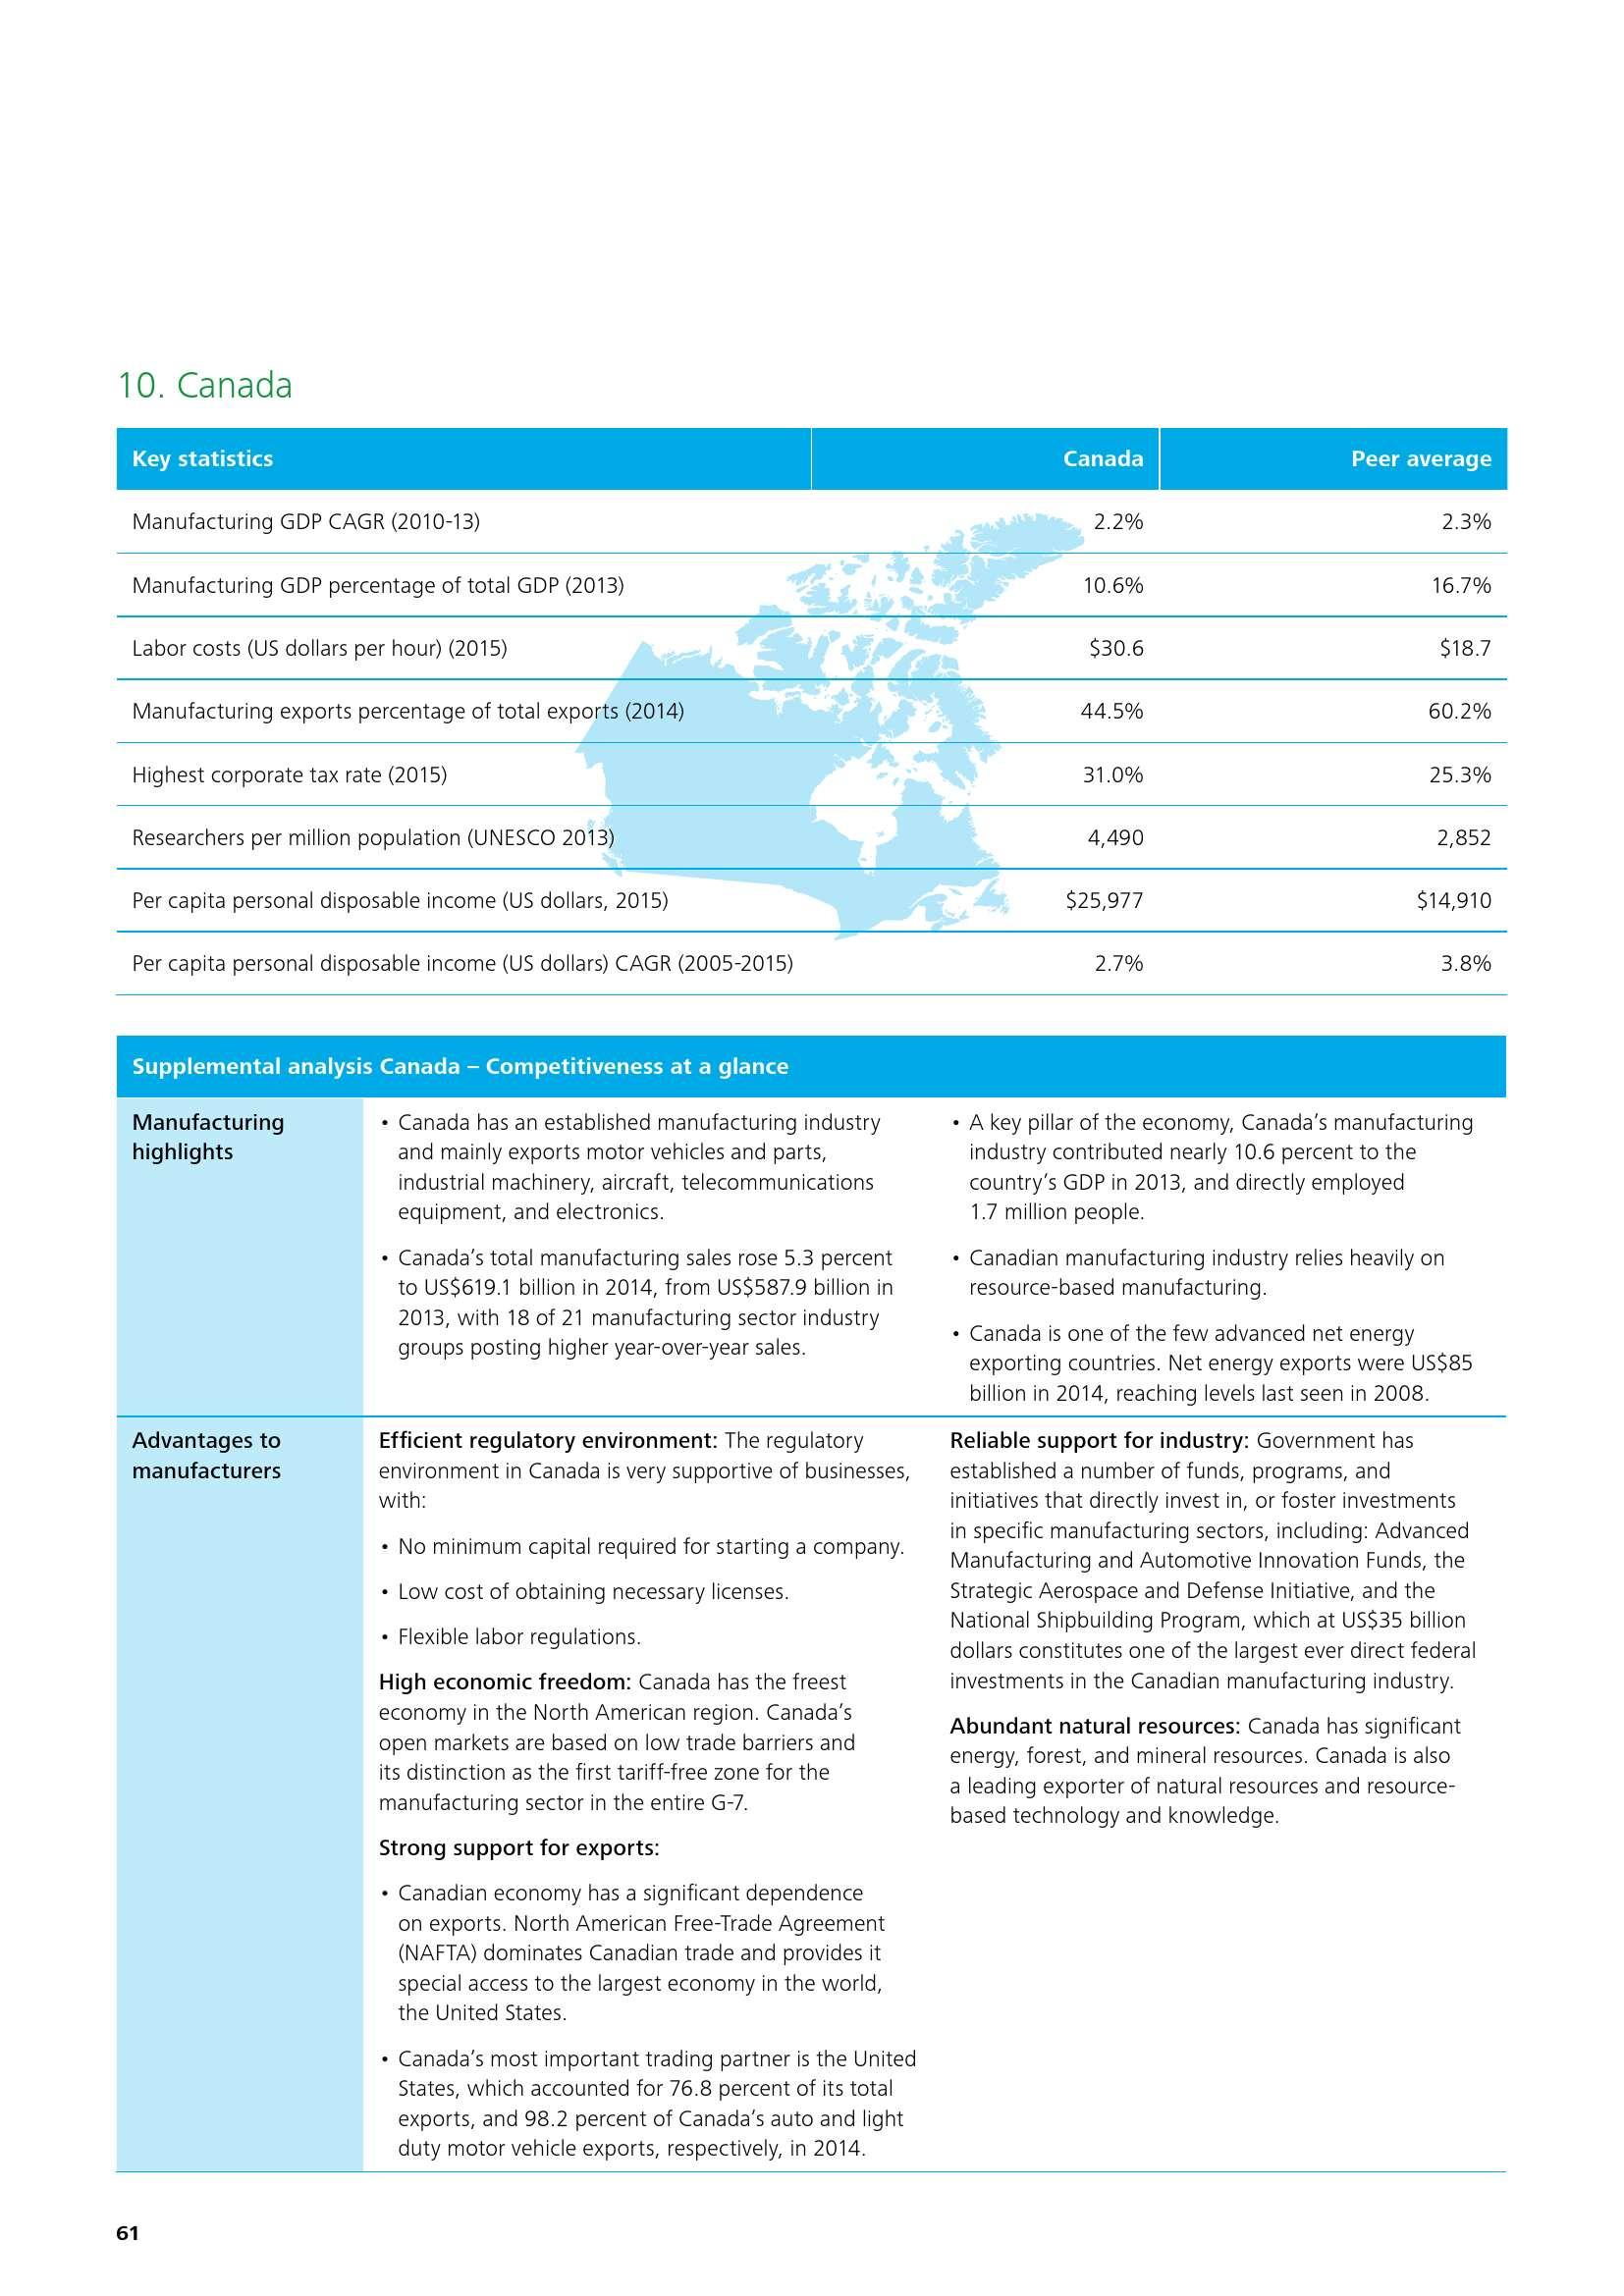 deloitte-cn-global-mfg-competitiveness-index-2016-en-160401_000064